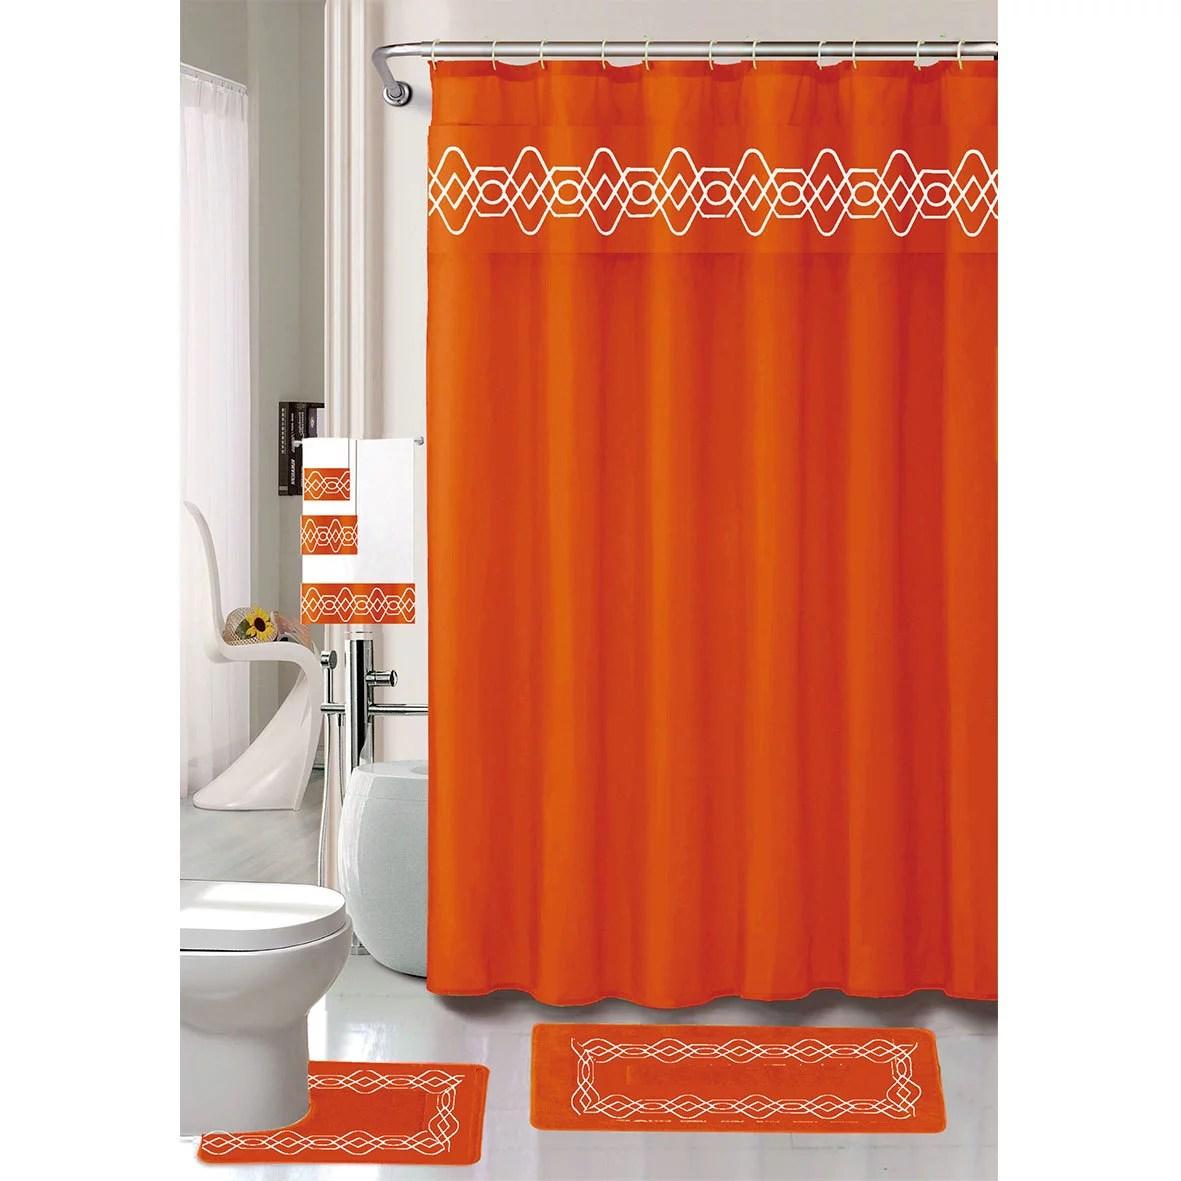 serena embroidery 18 pc bathroom accessories set bath mat contour rug shower curtain with hooks towels orange walmart com